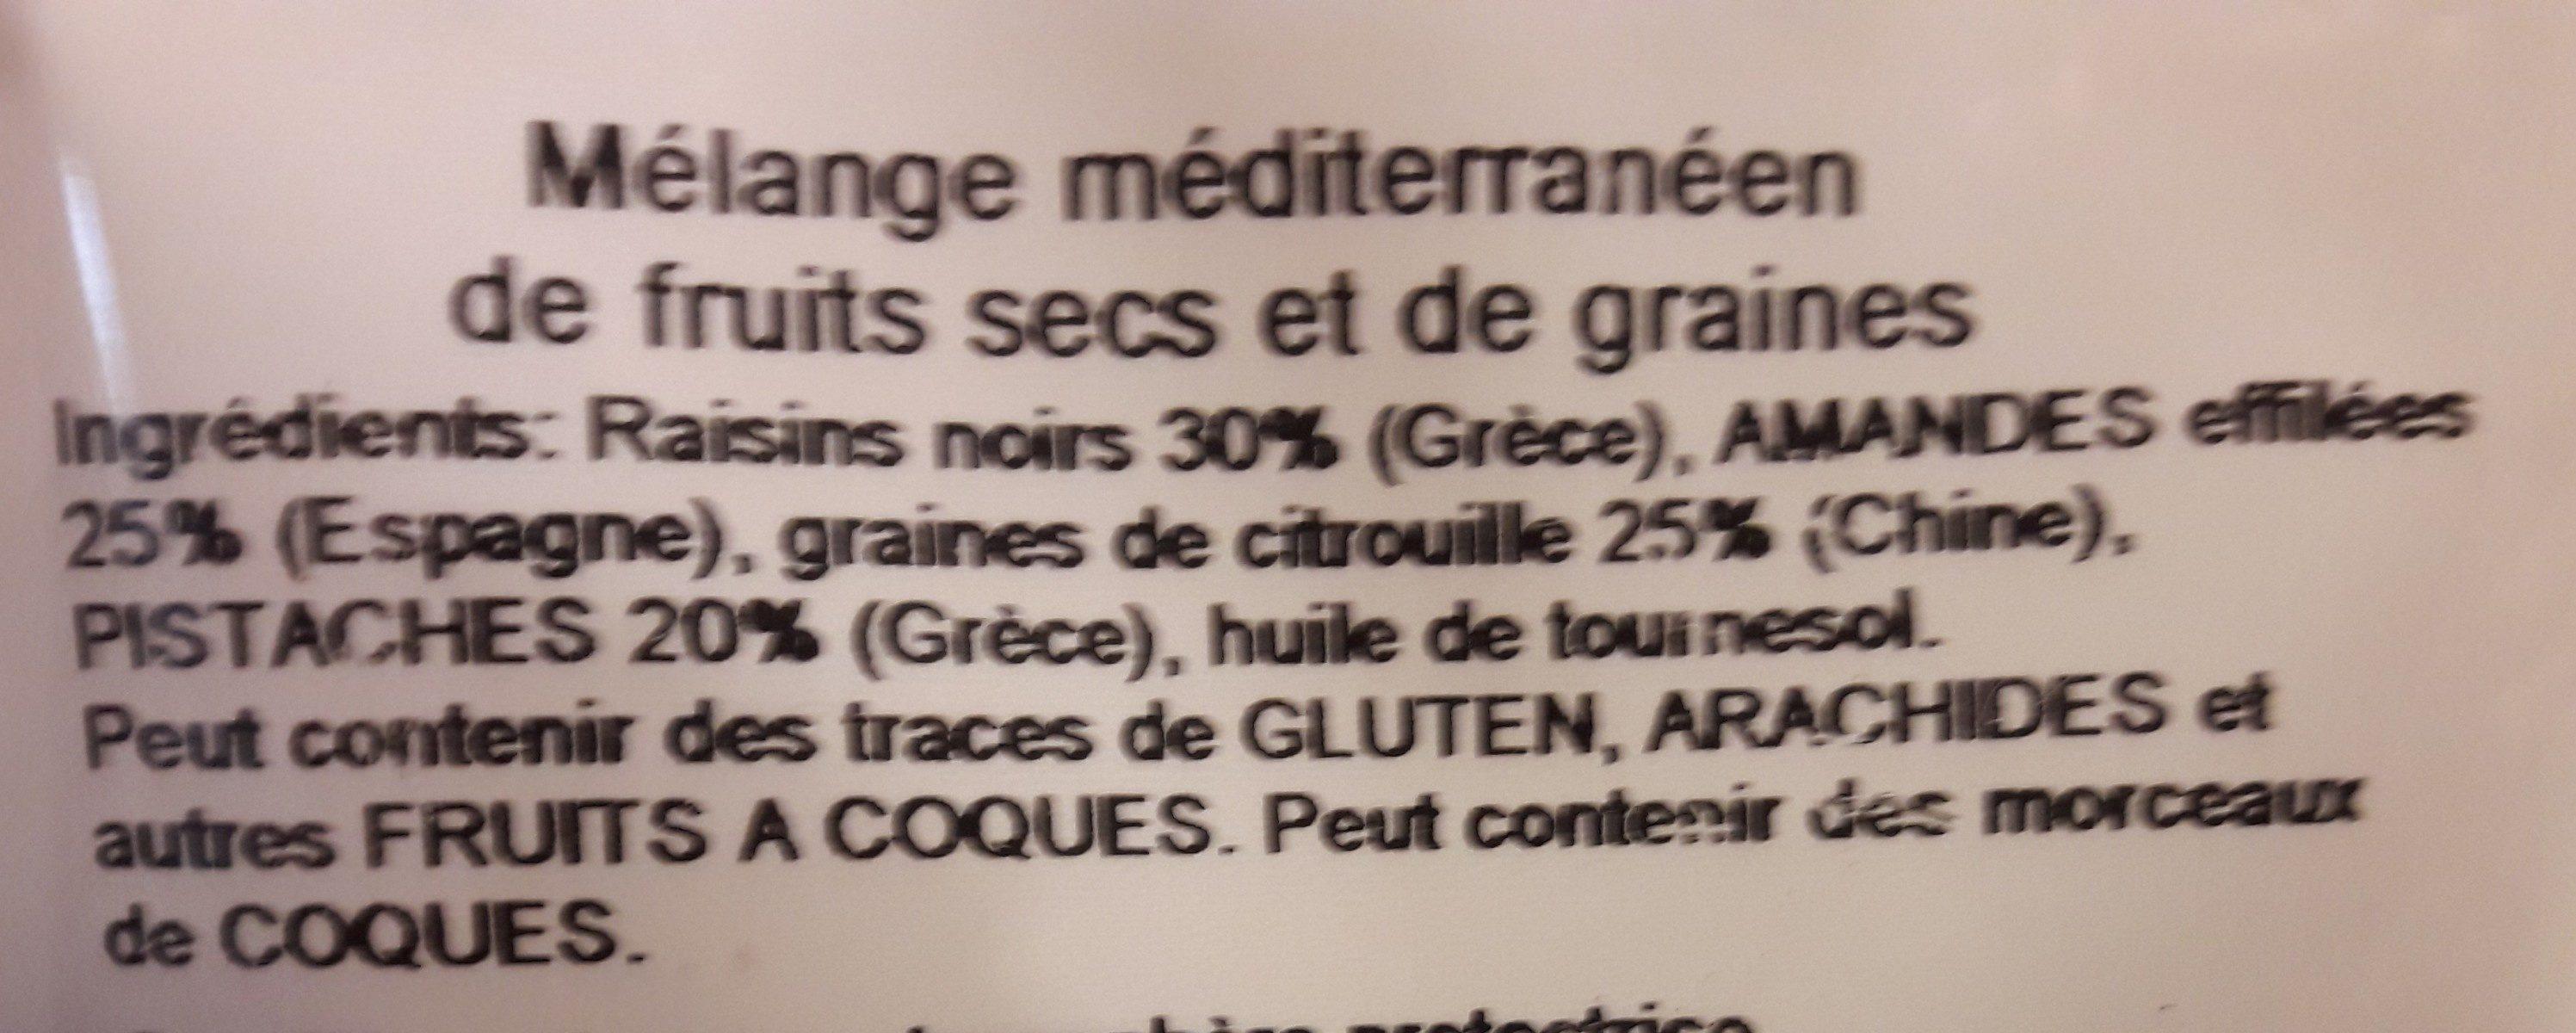 Fruit & Nuts Salad Mix - Mediterranean - Ingredients